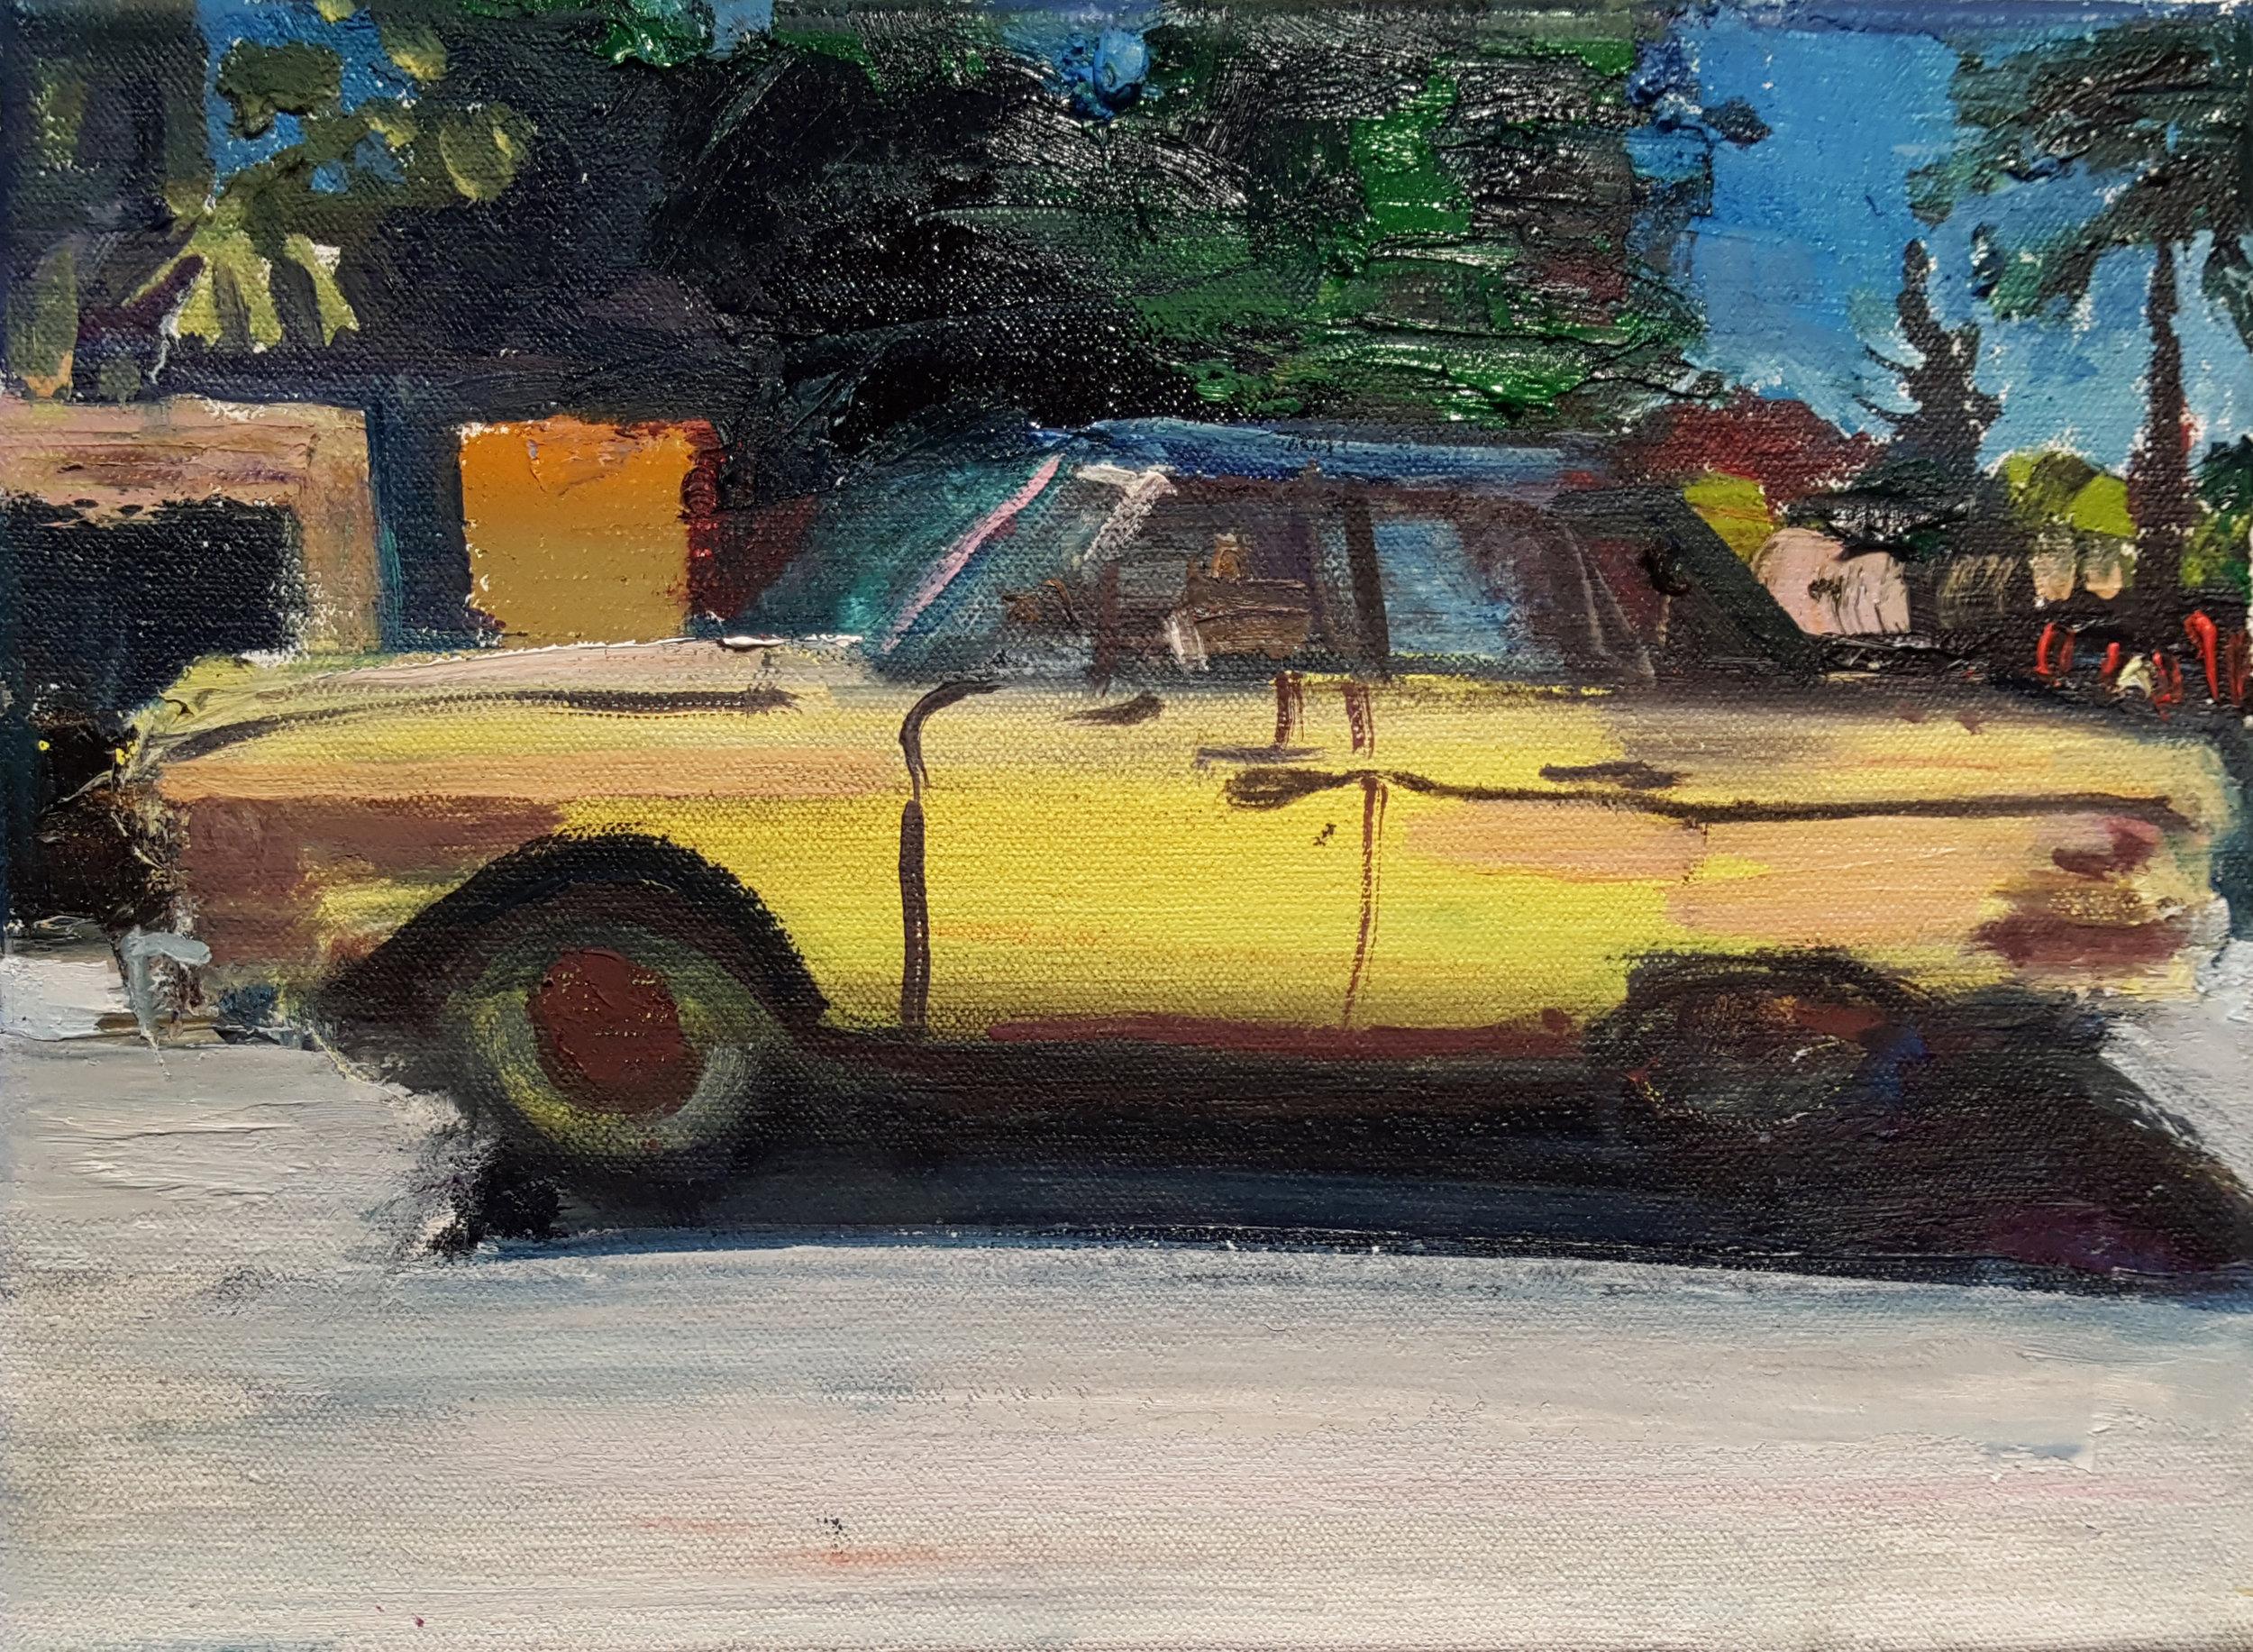 Matt Blackwell,  Falcon,  2017, Oil on canvas, 8h x 11w in.